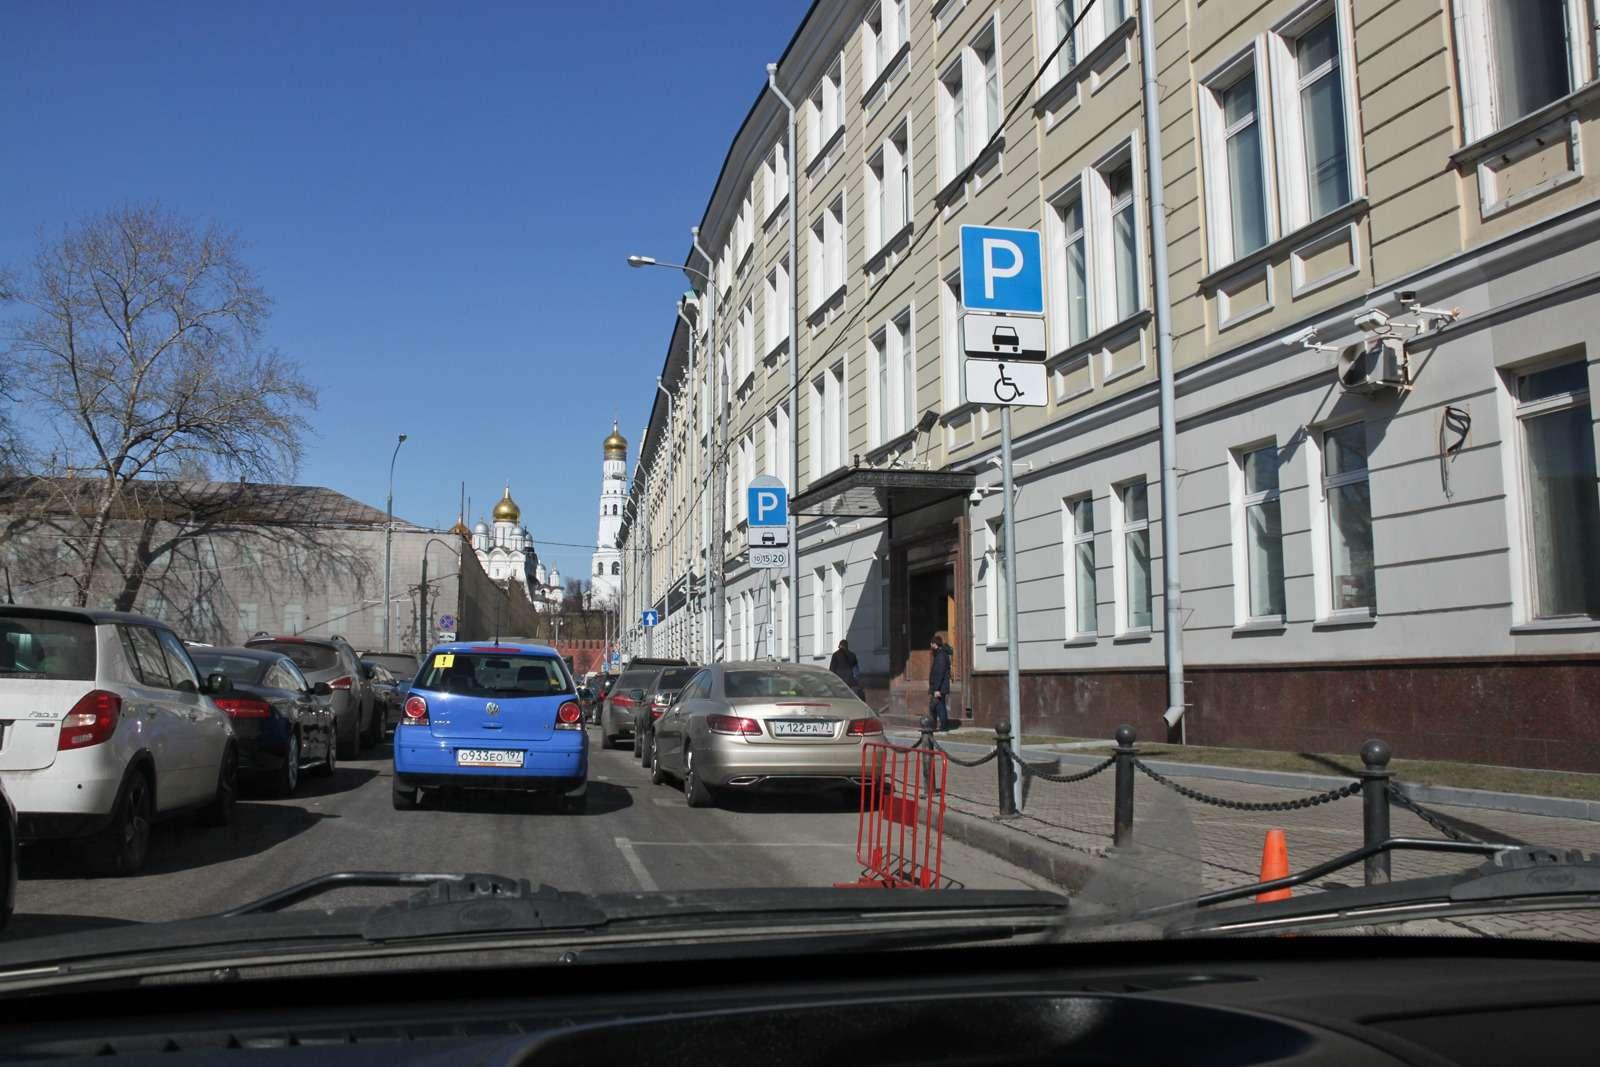 Парковка— дляинвалидов или длялжеинвалидов? Рейд ЗР— фото 585771